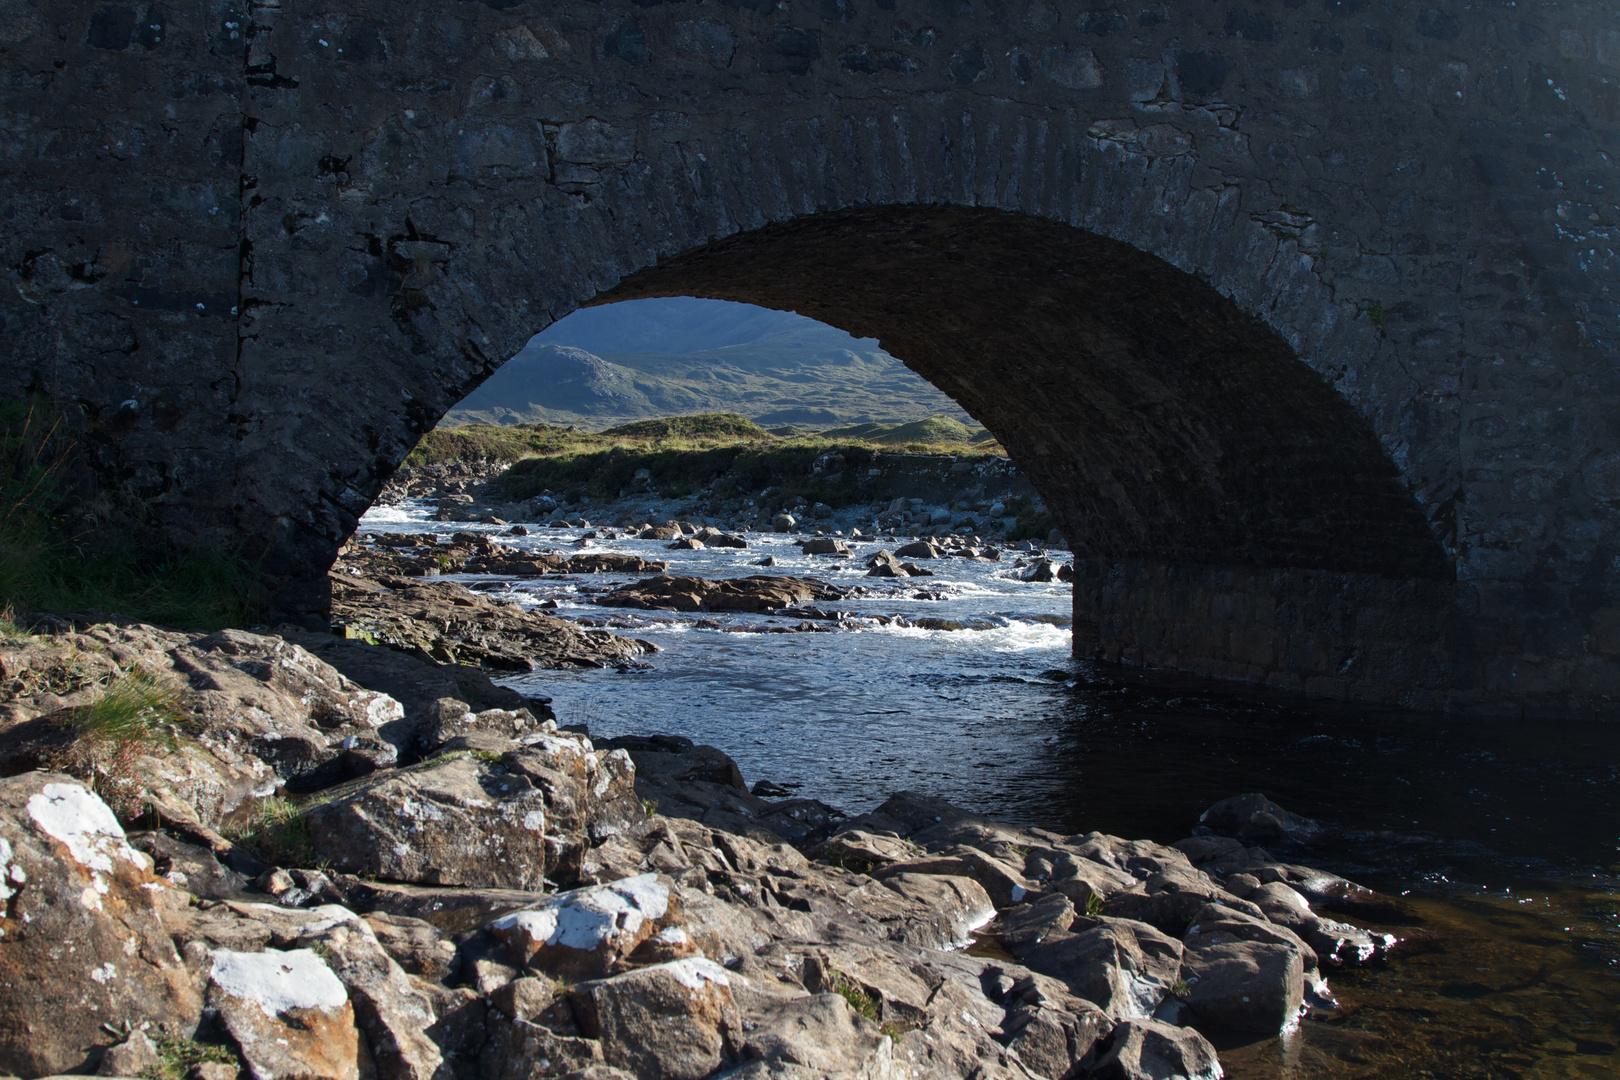 Brücke am Fluß